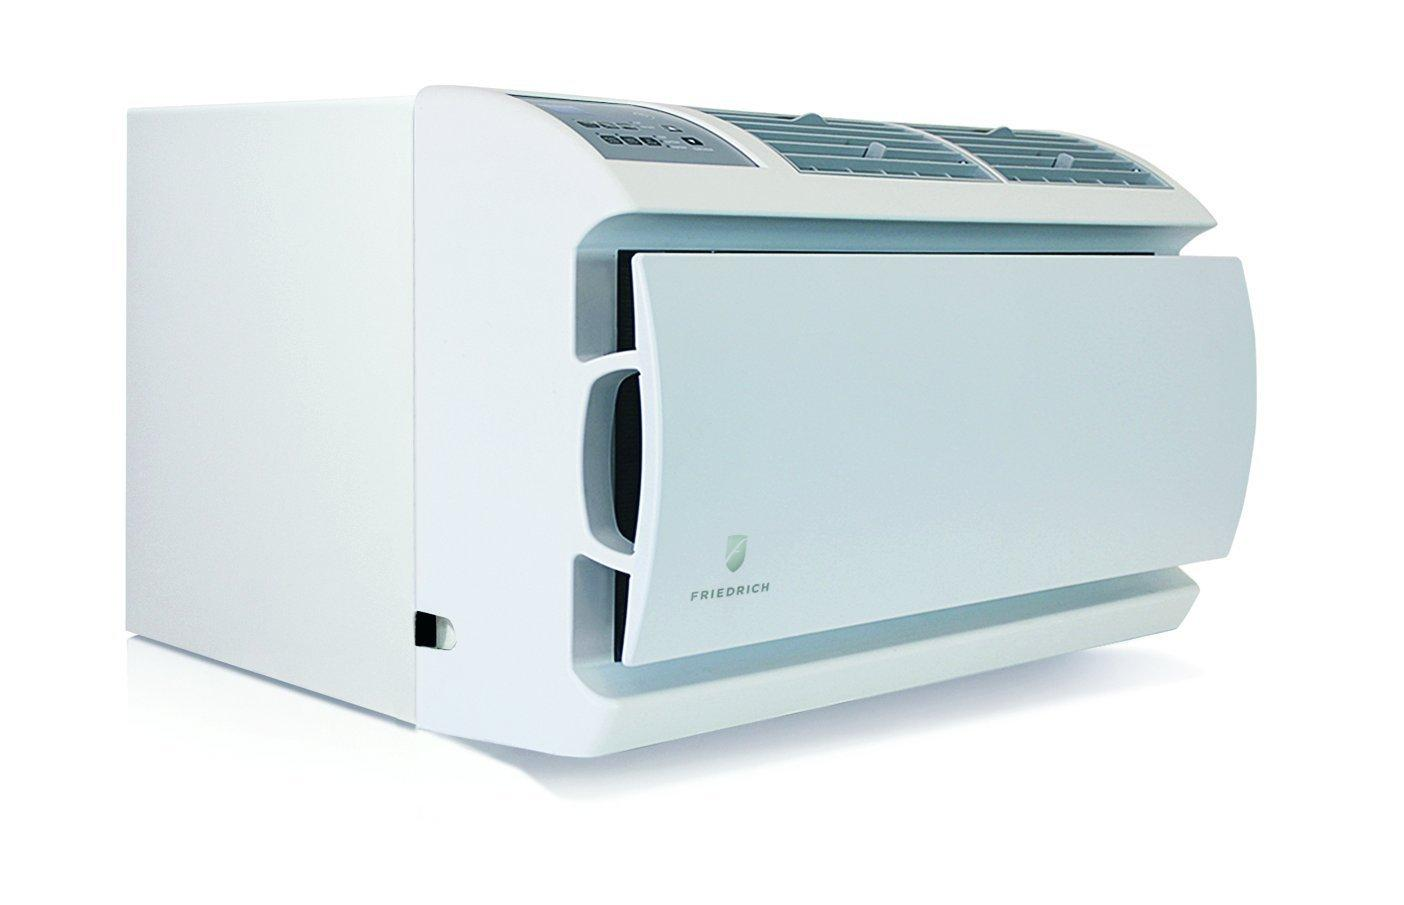 Model: WS12D30 Style: 12 000 BTU Thru the Wall Air Conditioner #10171B